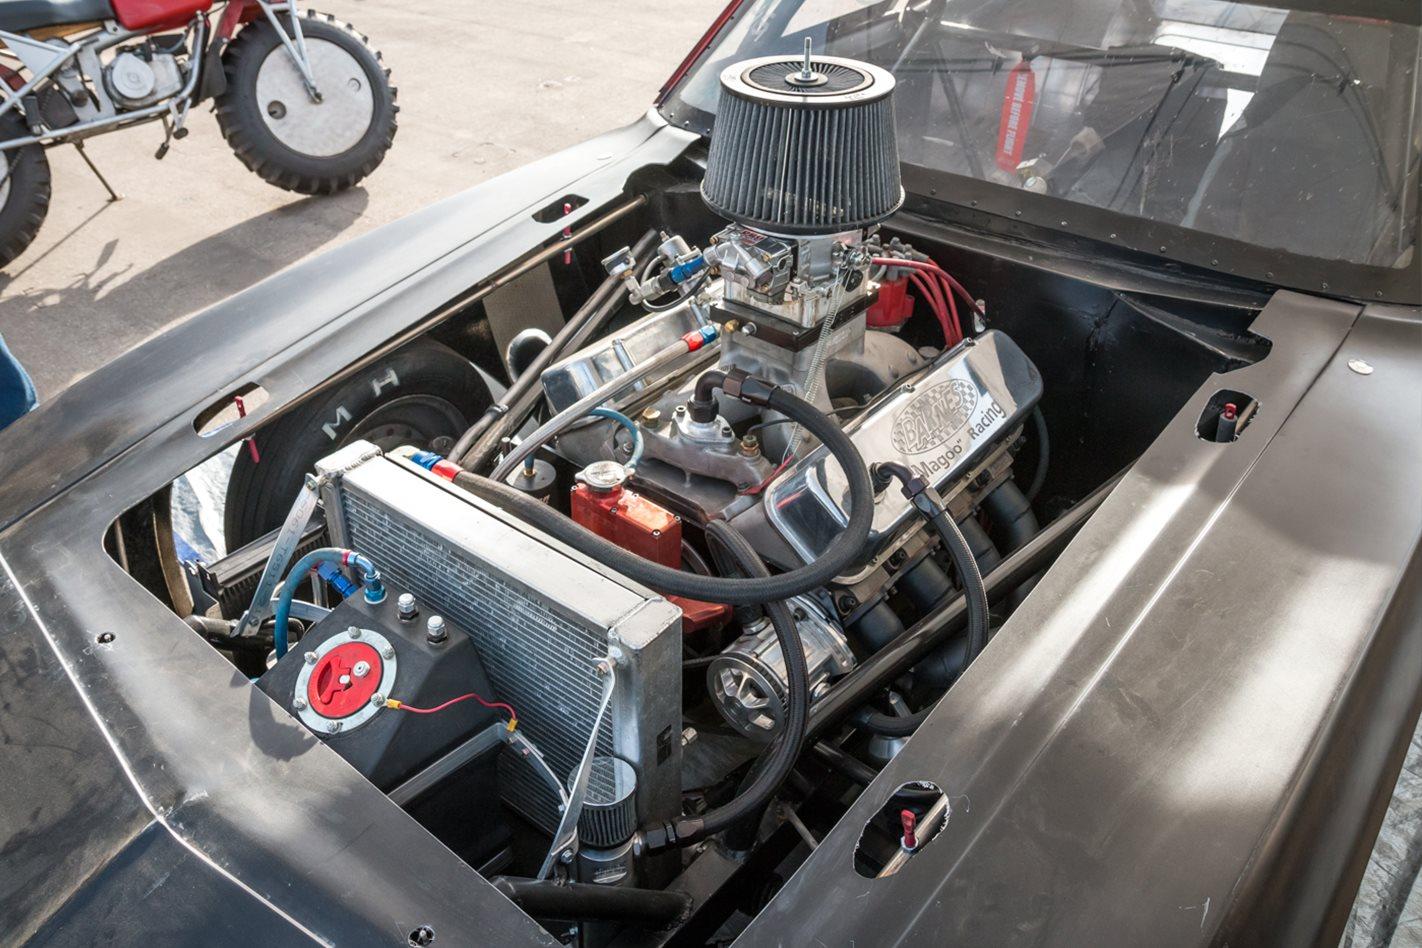 Dave Mallory Camaro engine